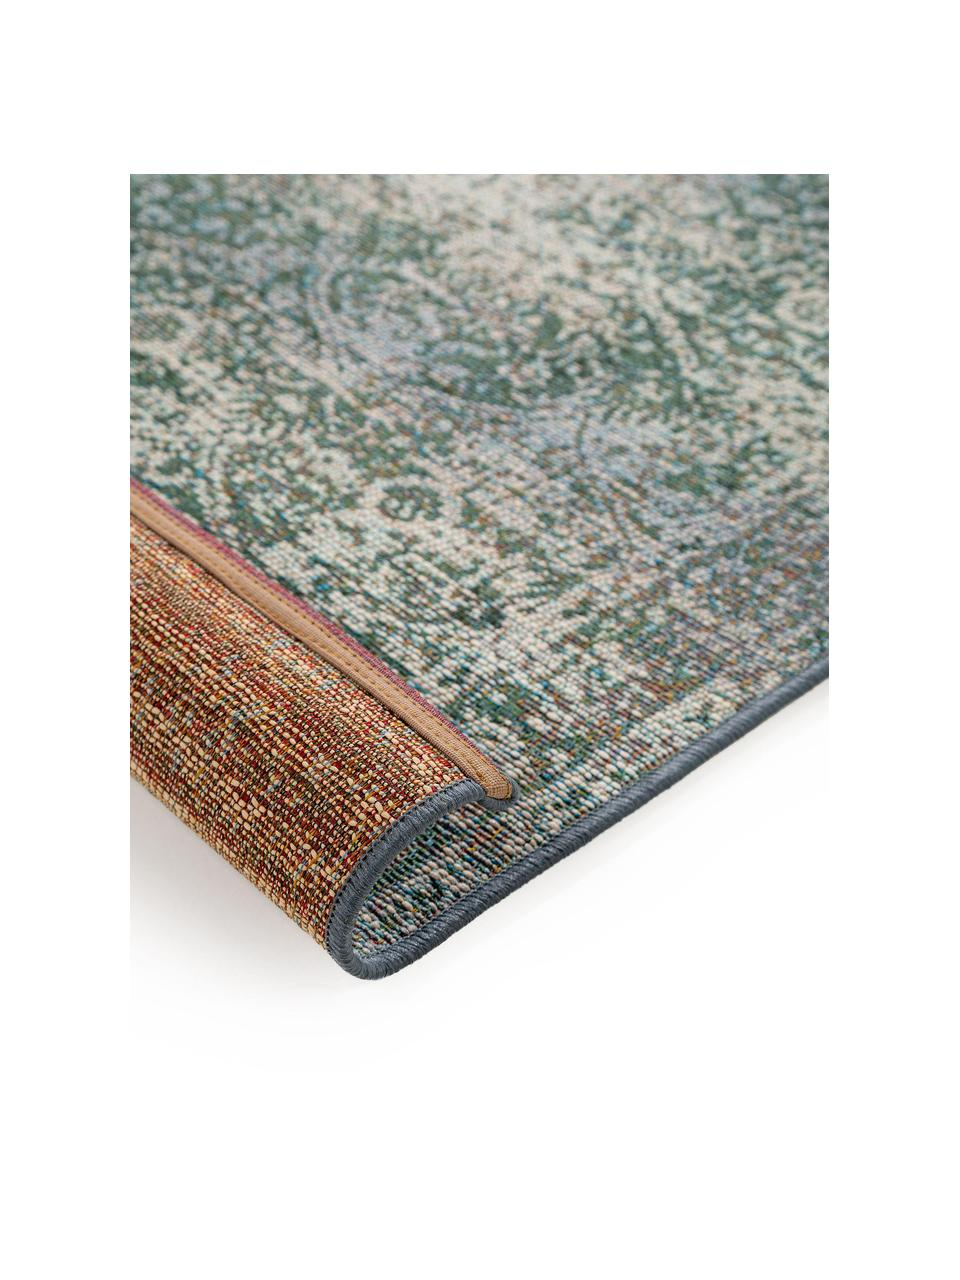 Passatoia vintage da interno-esterno Artis, 76% polipropilene, 23% poliestere, 1% lattice, Verde, beige, Larg. 80 x Lung. 250 cm